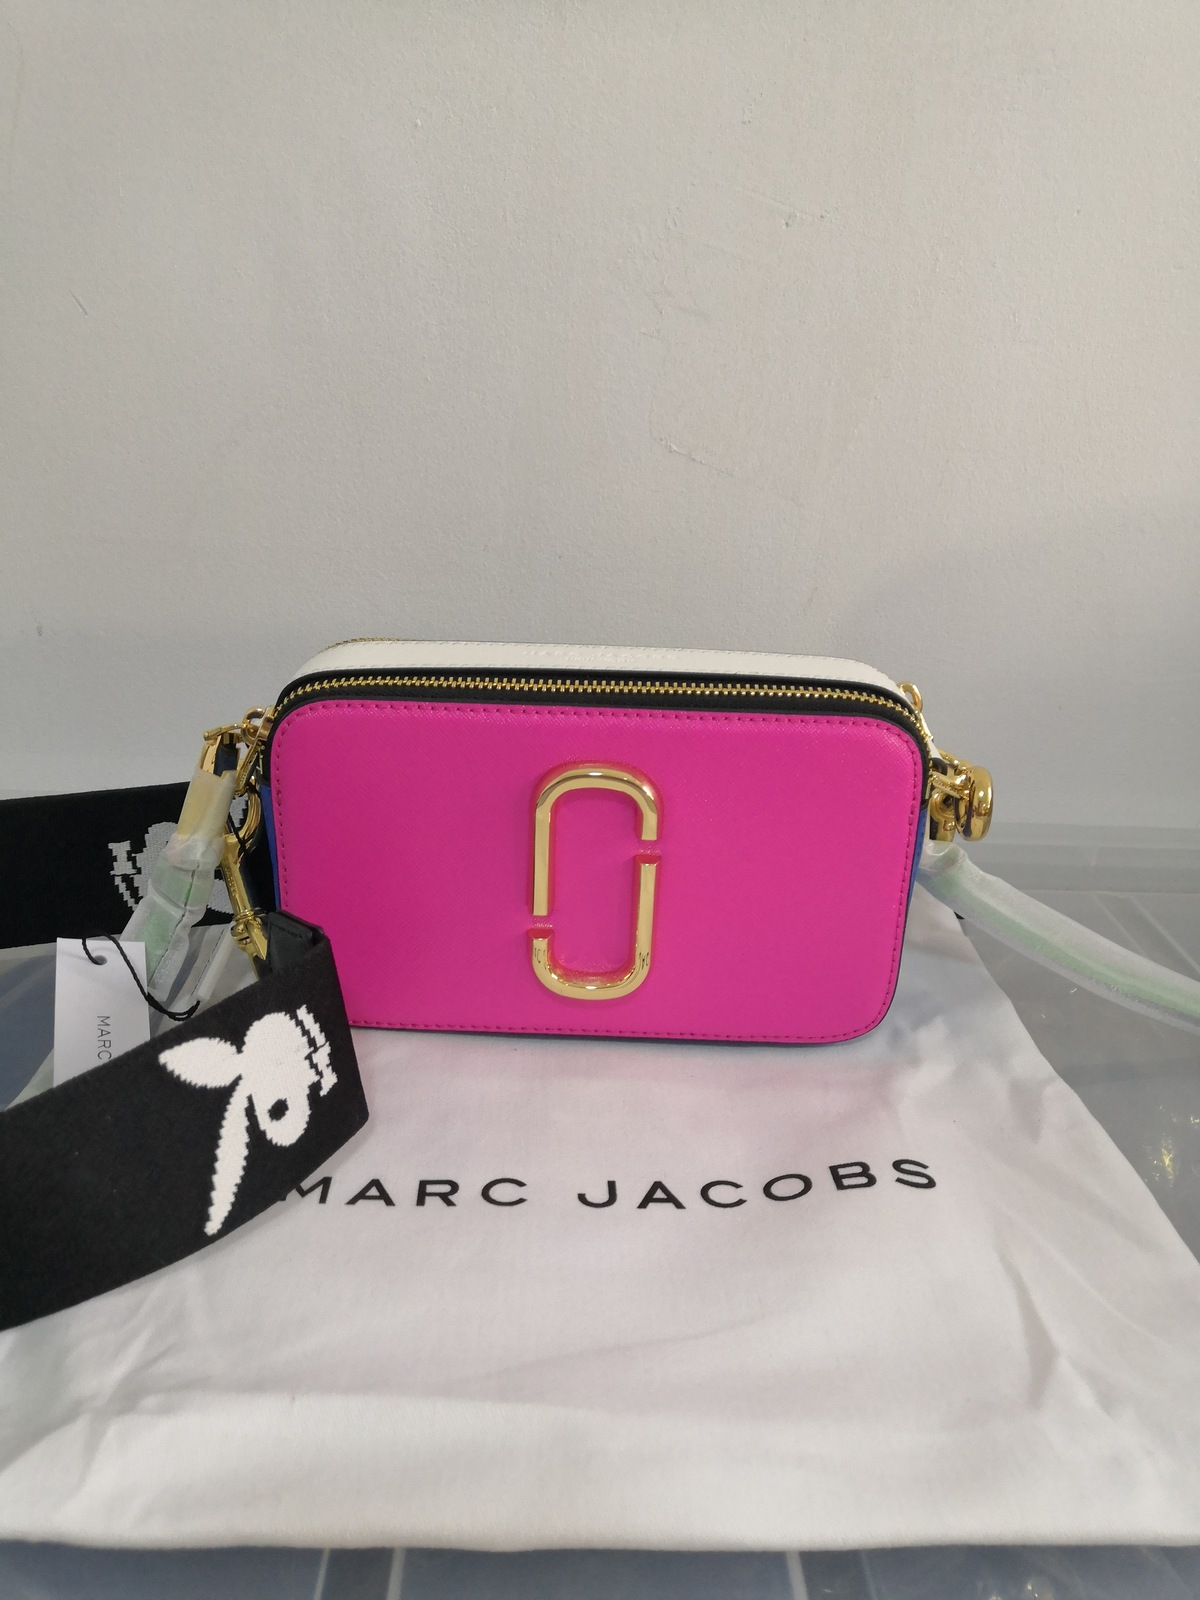 1431fb4f211d Marc Jacobs Snapshot Small Camera Bag and 49 similar items. Img 20181127  082635